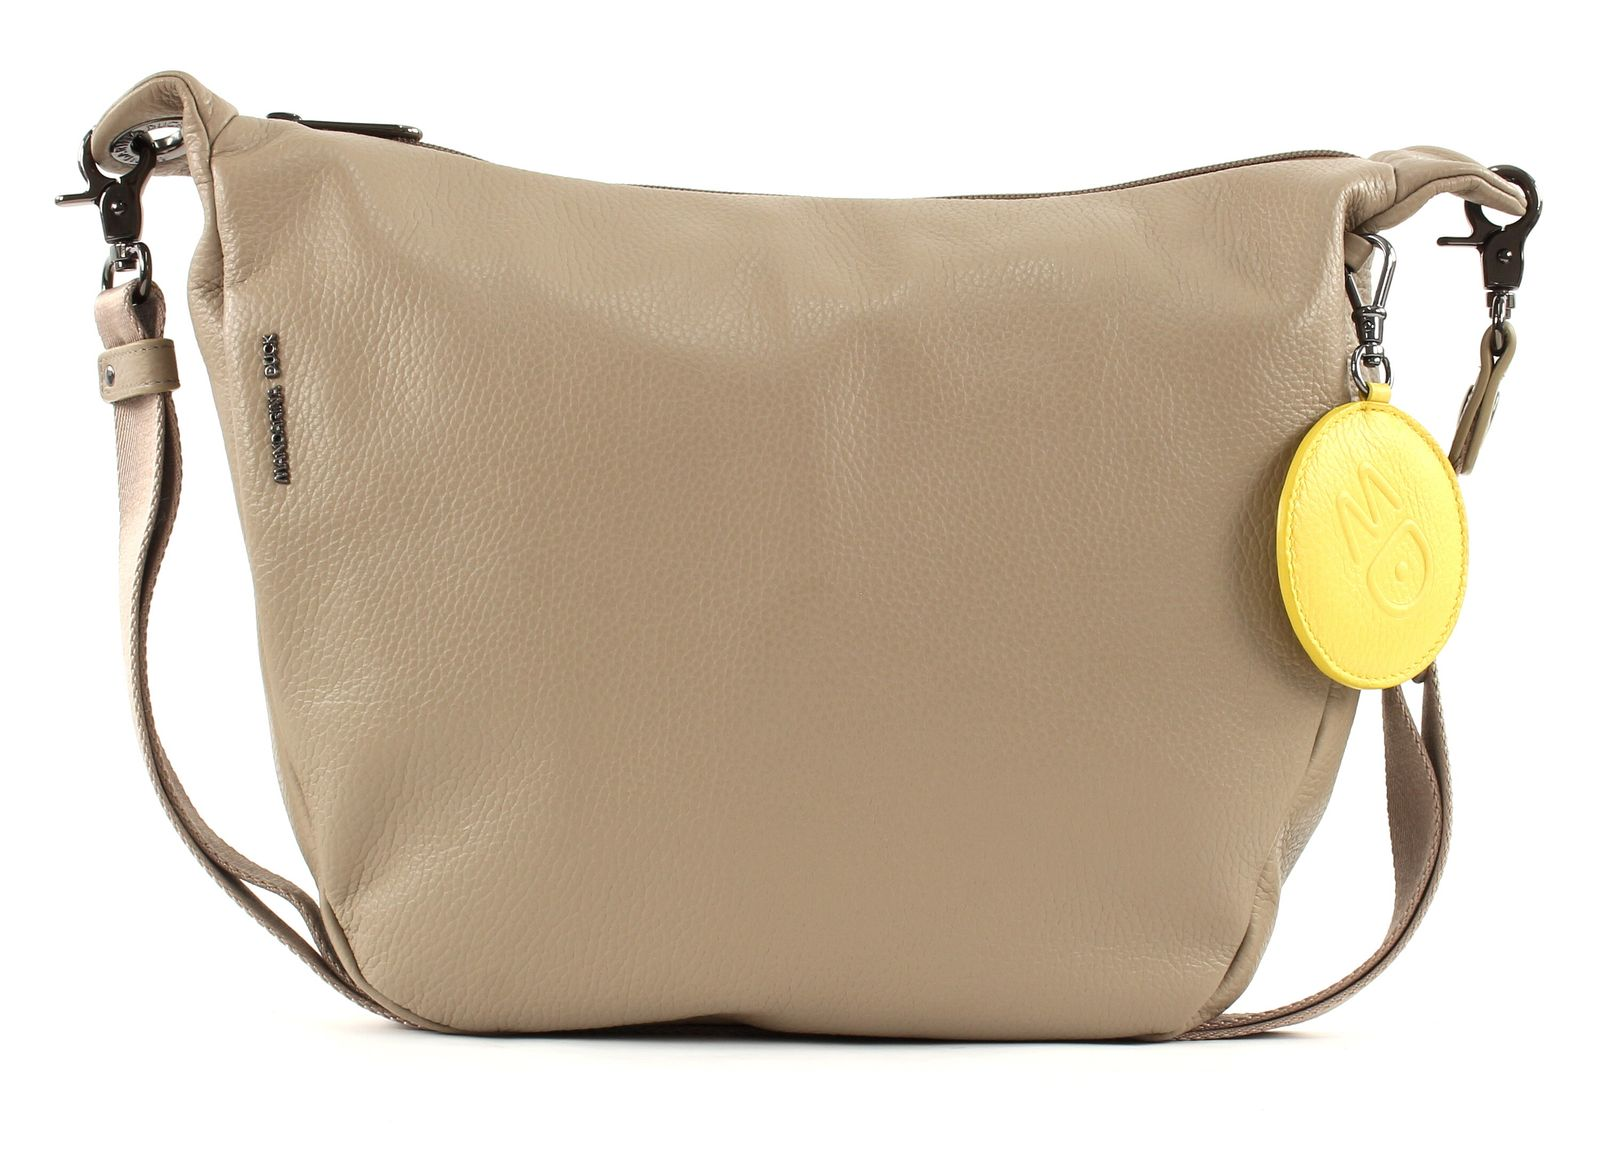 MANDARINA DUCK Shoulder Bag Crossover